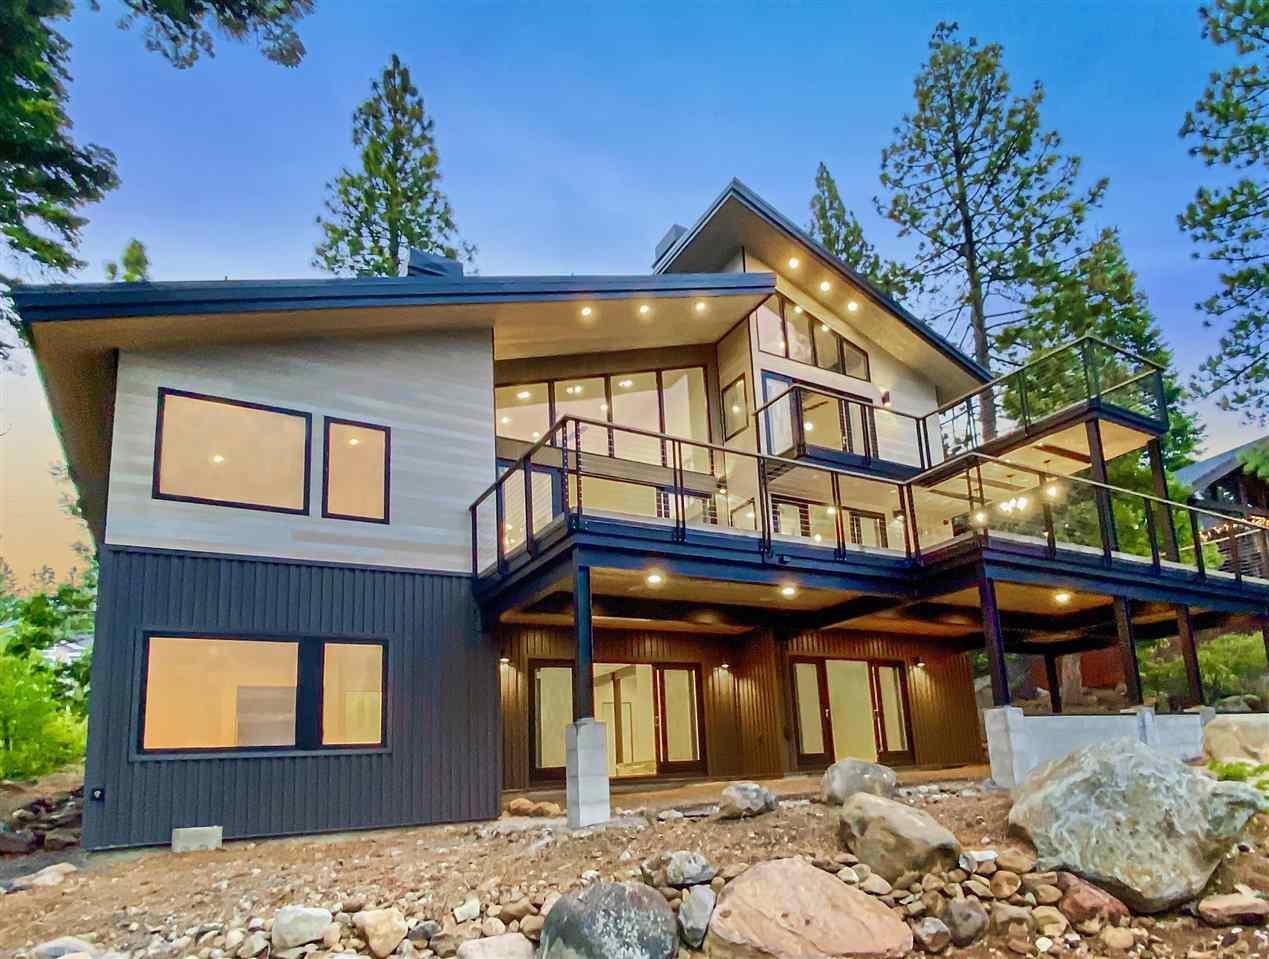 Image for 240 Briarwood Circle, Tahoe City, CA 96145-9999